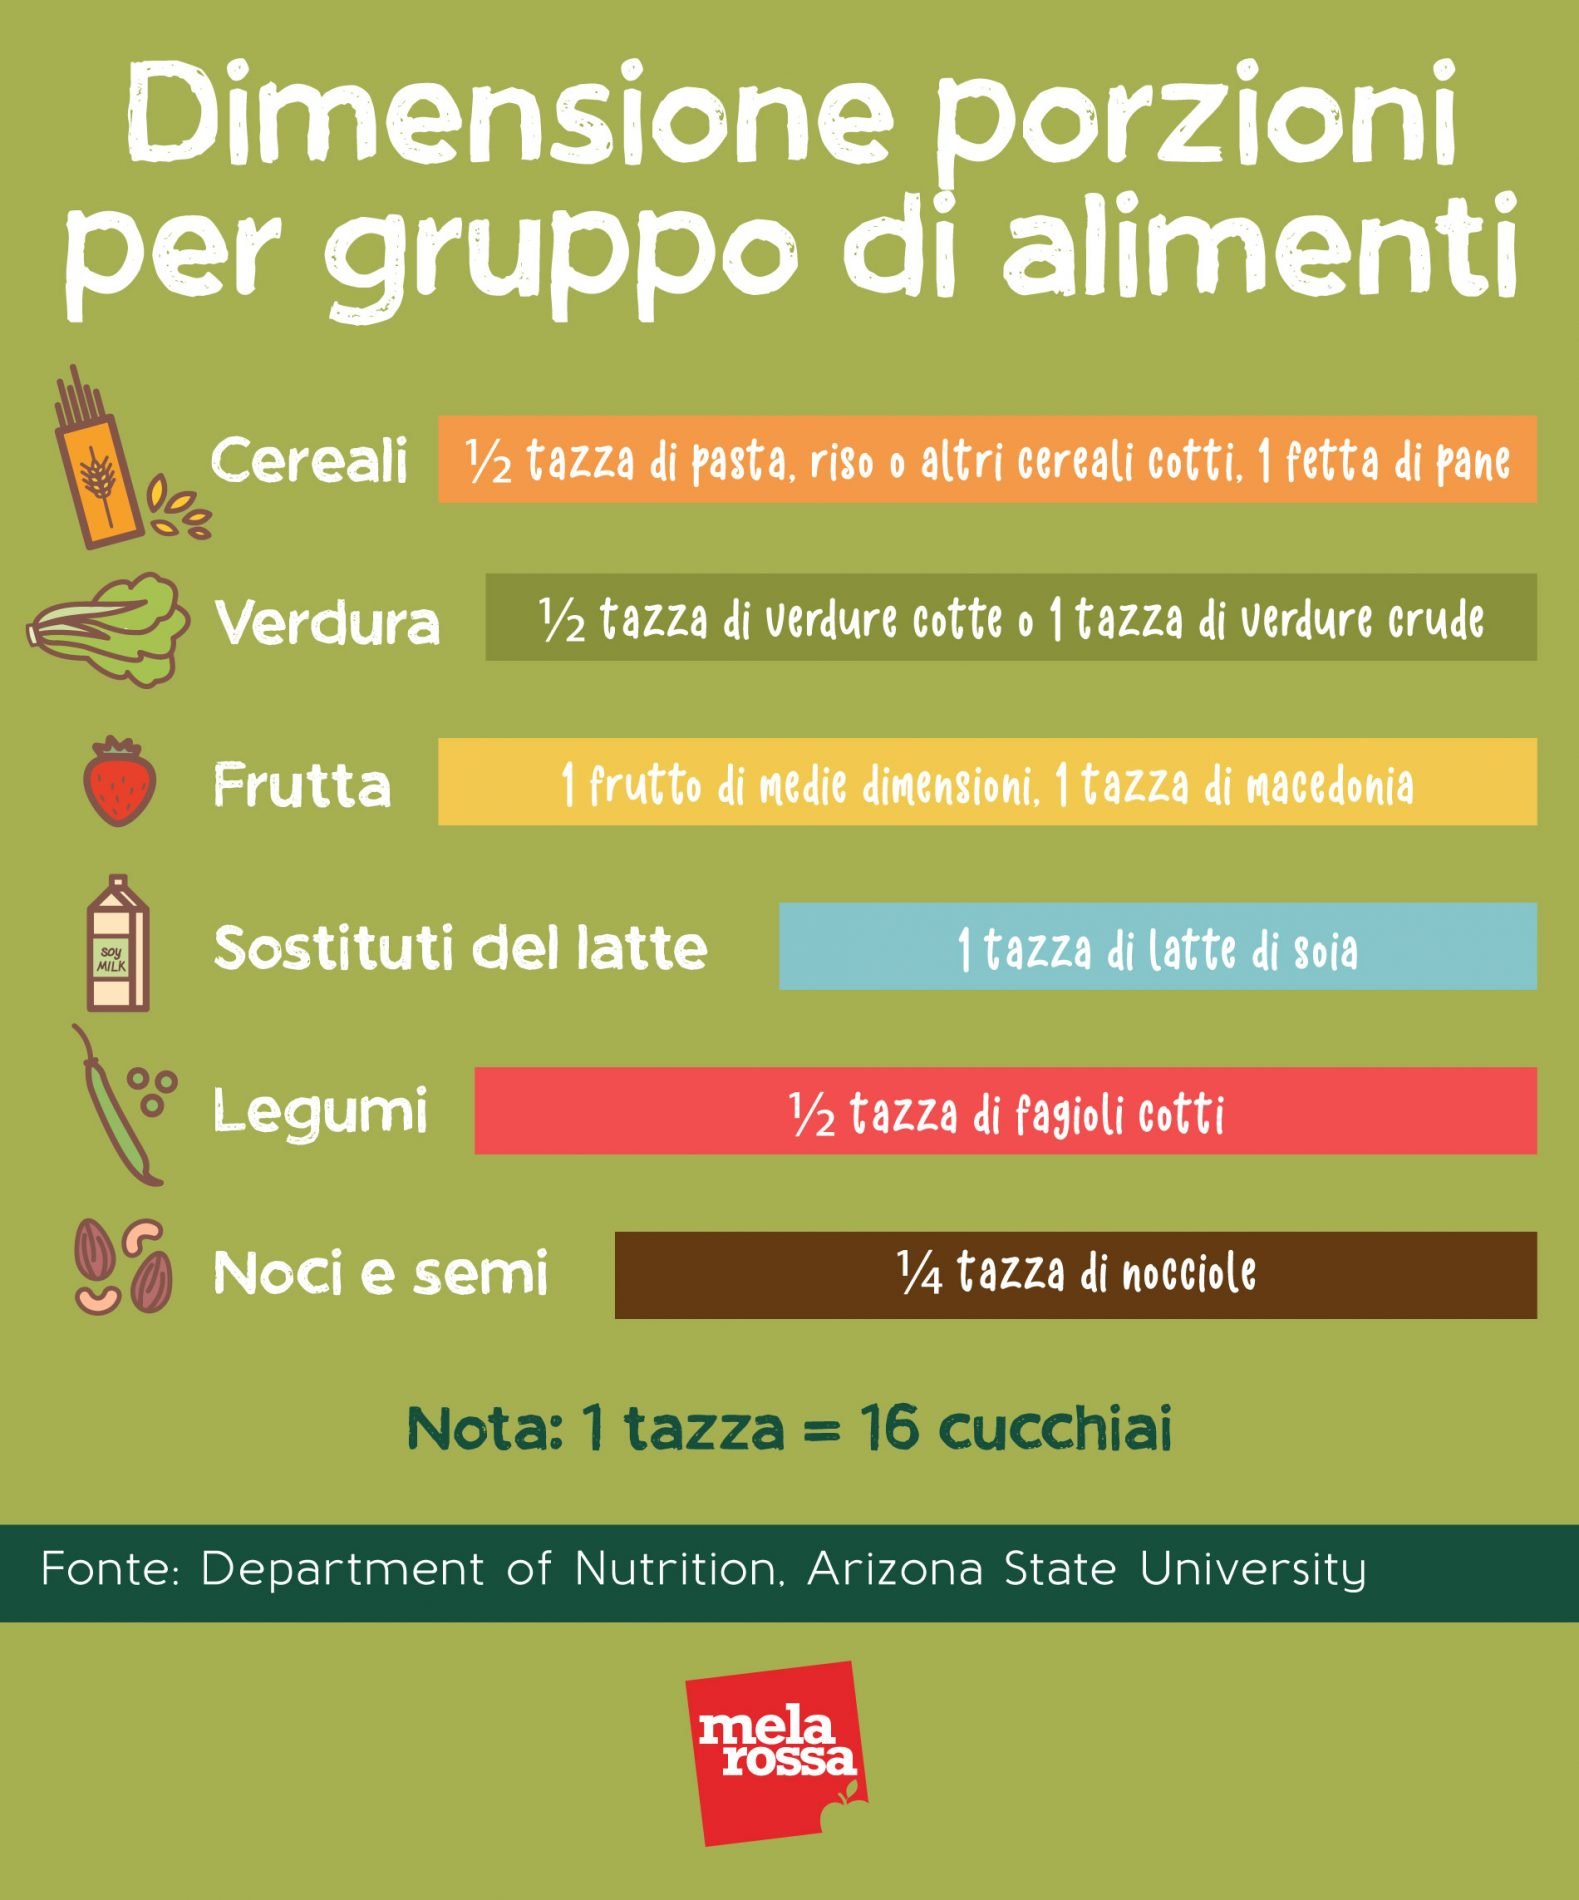 dieta vegana piramide alimentare porzioni gruppi alimenti